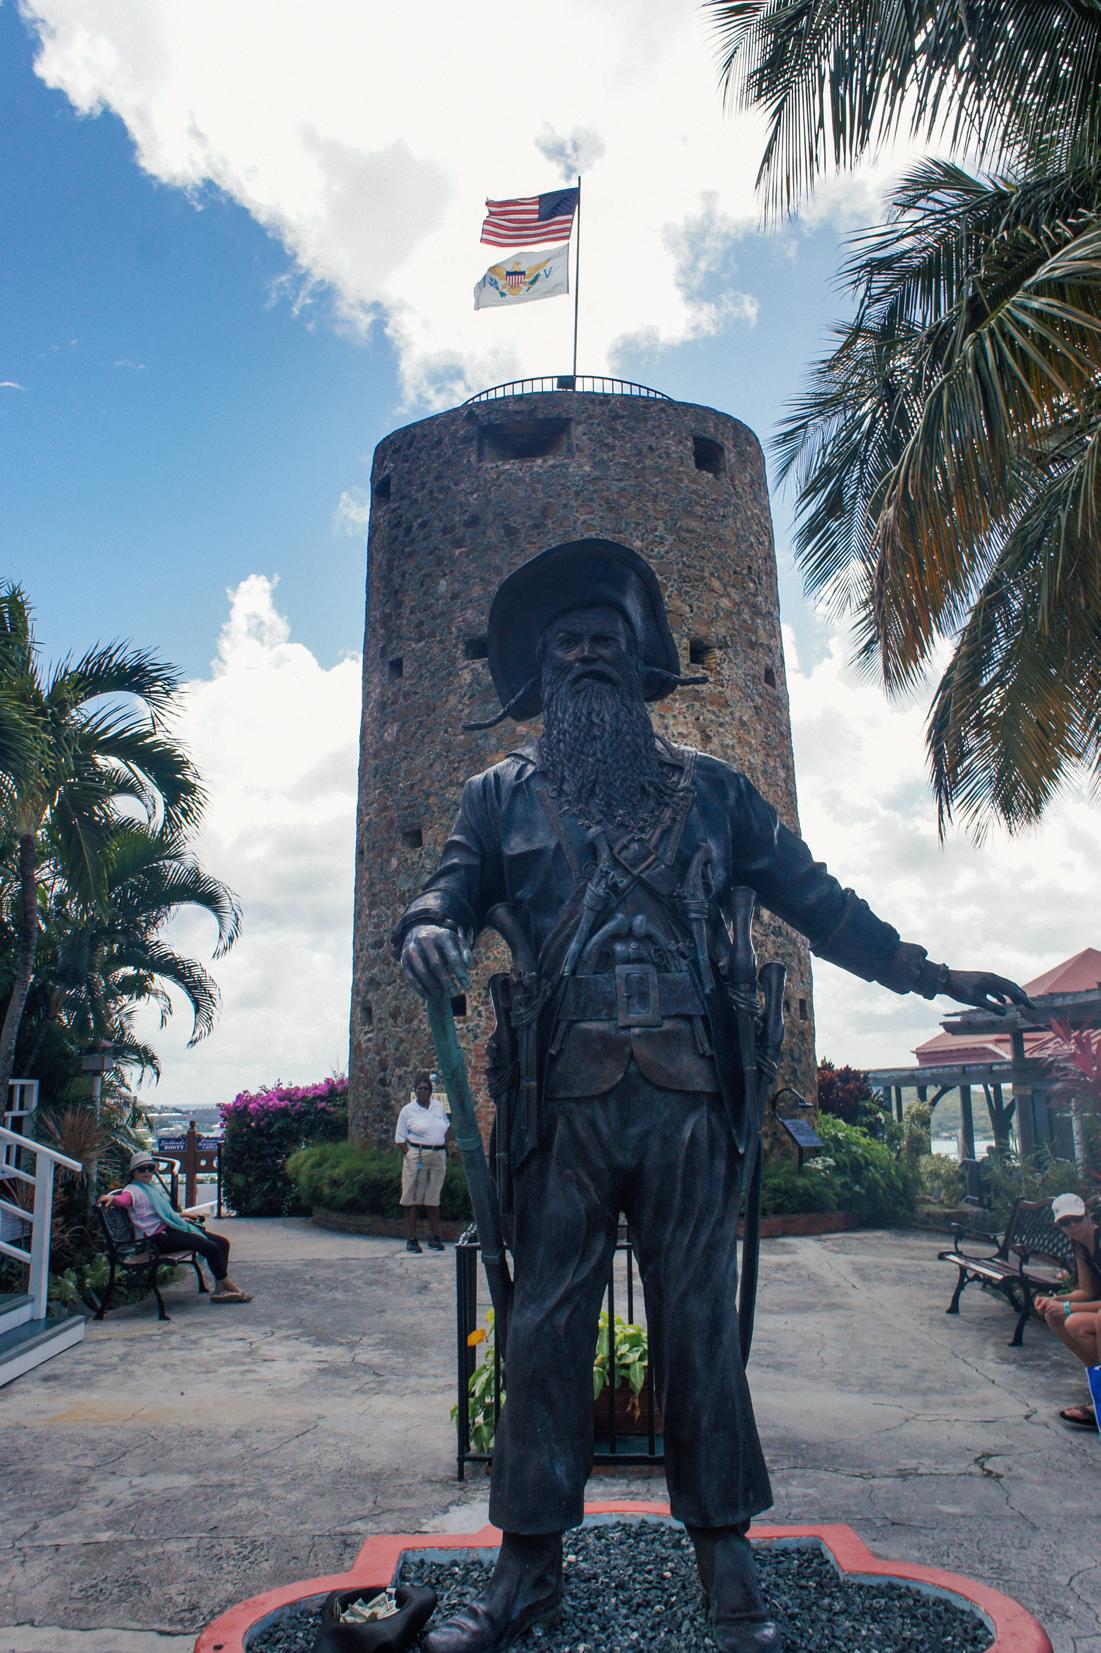 Blackbeard Statue at St. Thomas | truelane